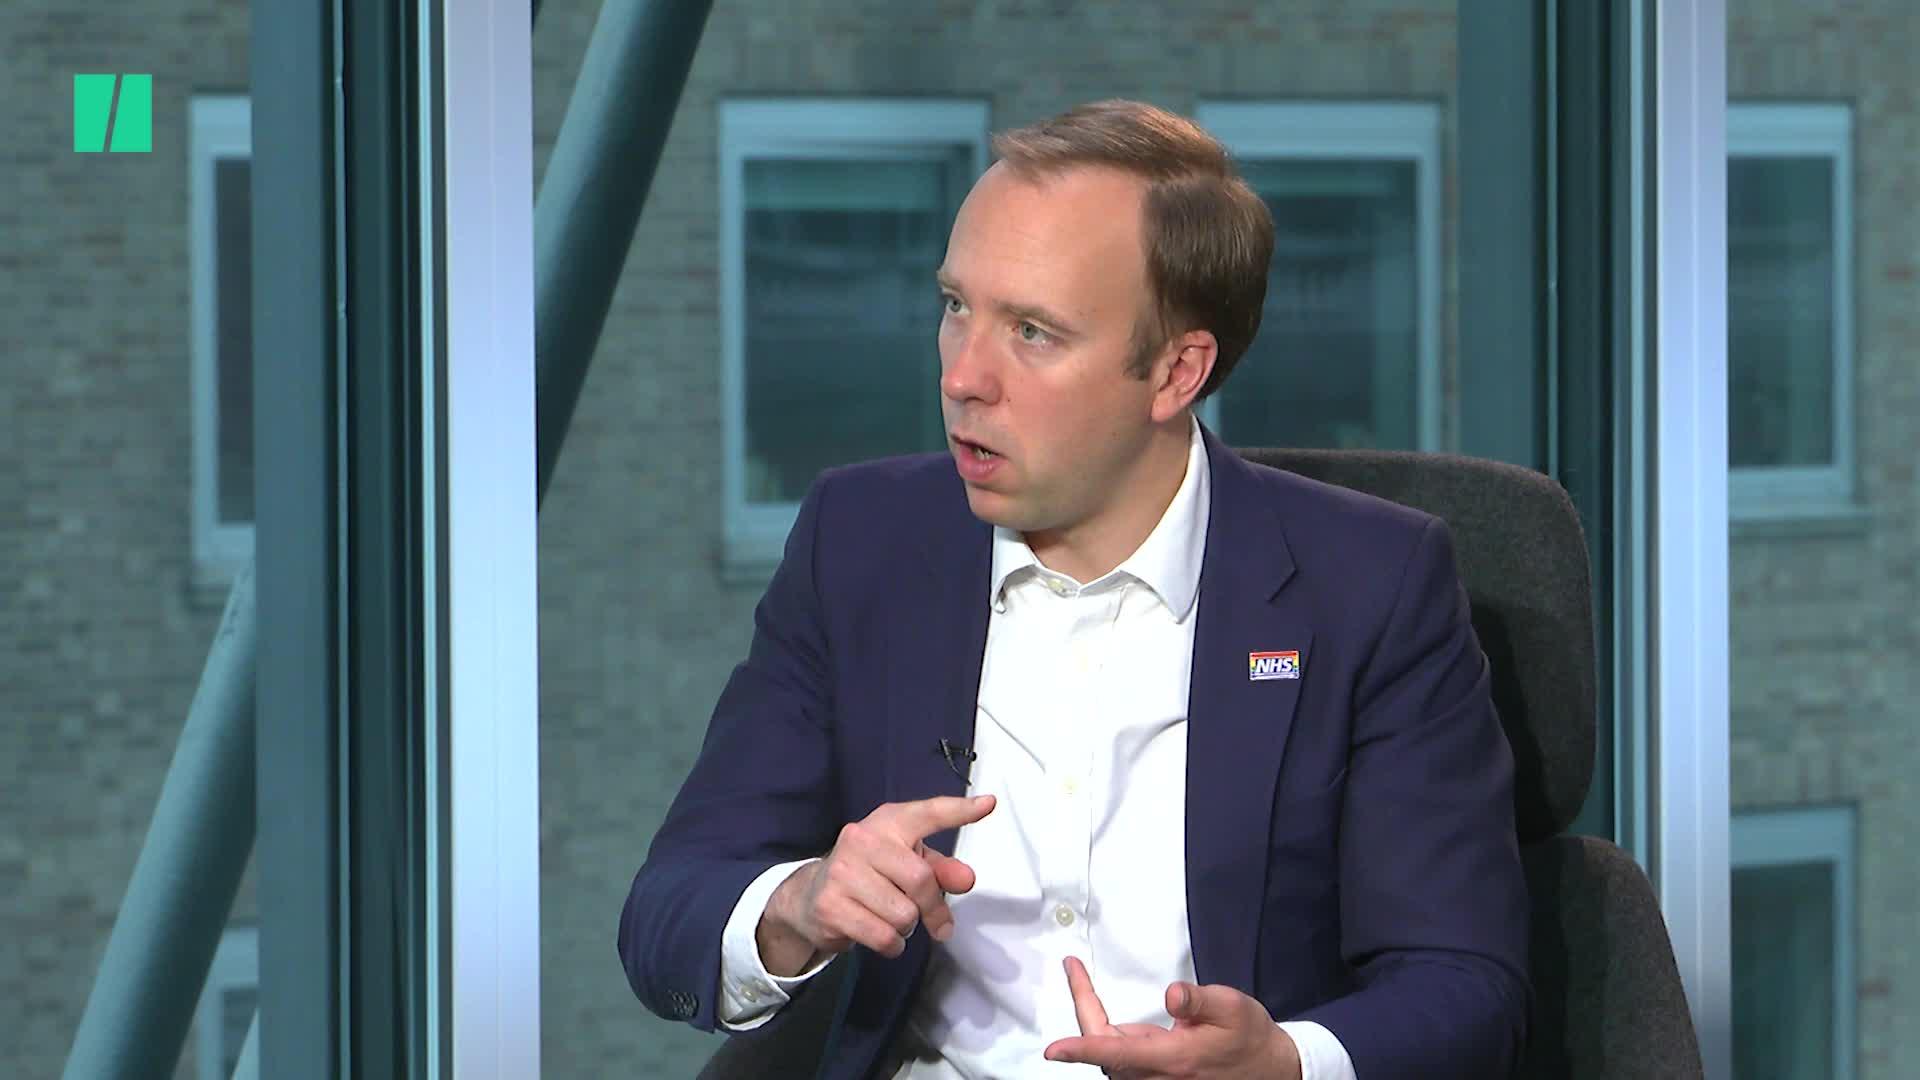 Matt Hancock On His Conservative Leadership Bid, NHS And Digital Rights